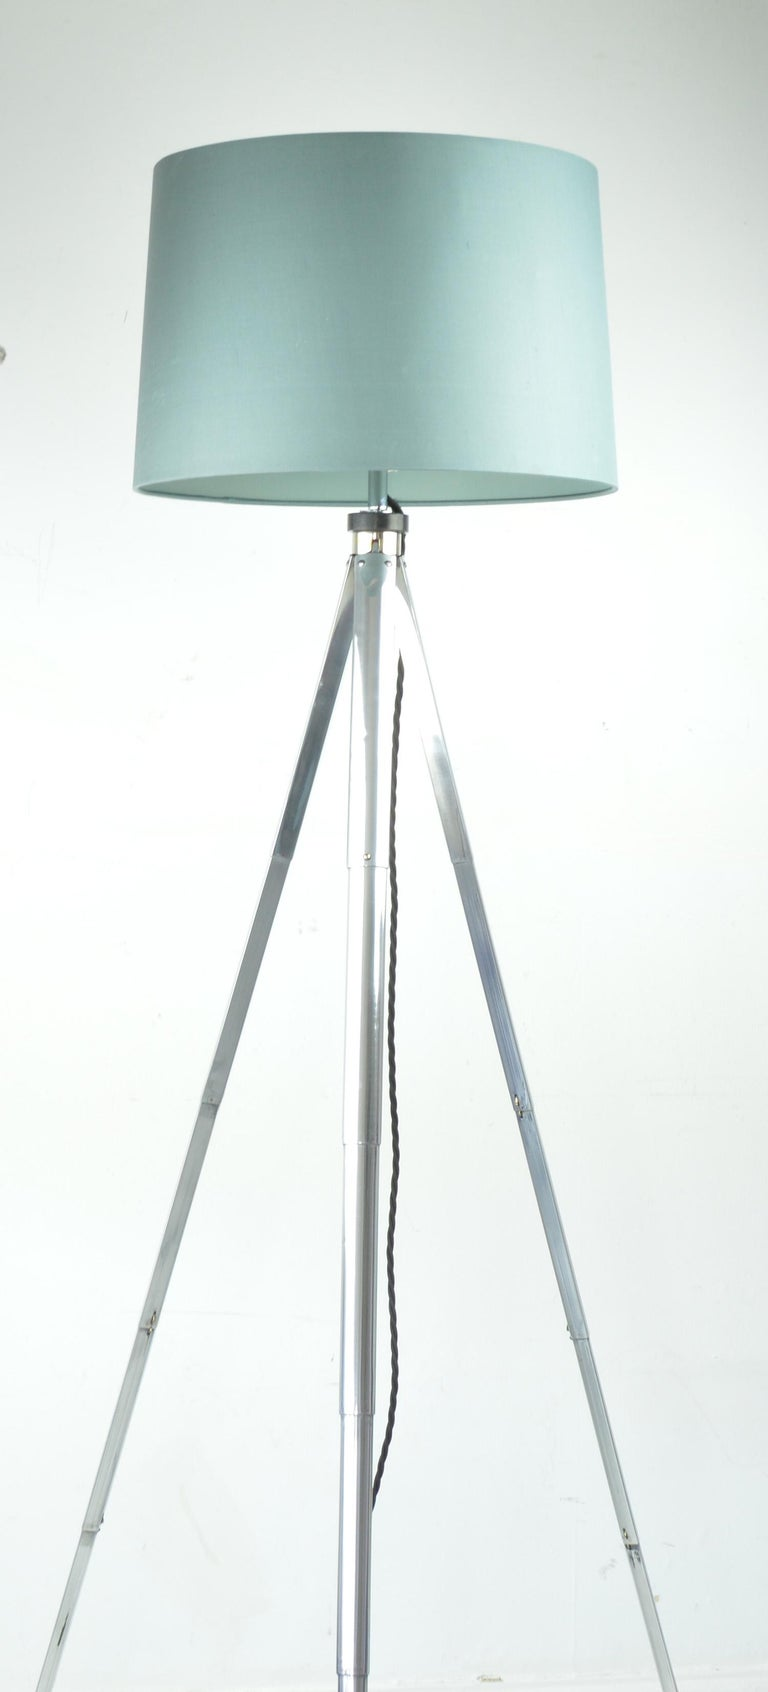 Industrial Vintage Tripod Floor Light, English, Mid-20th Century For Sale